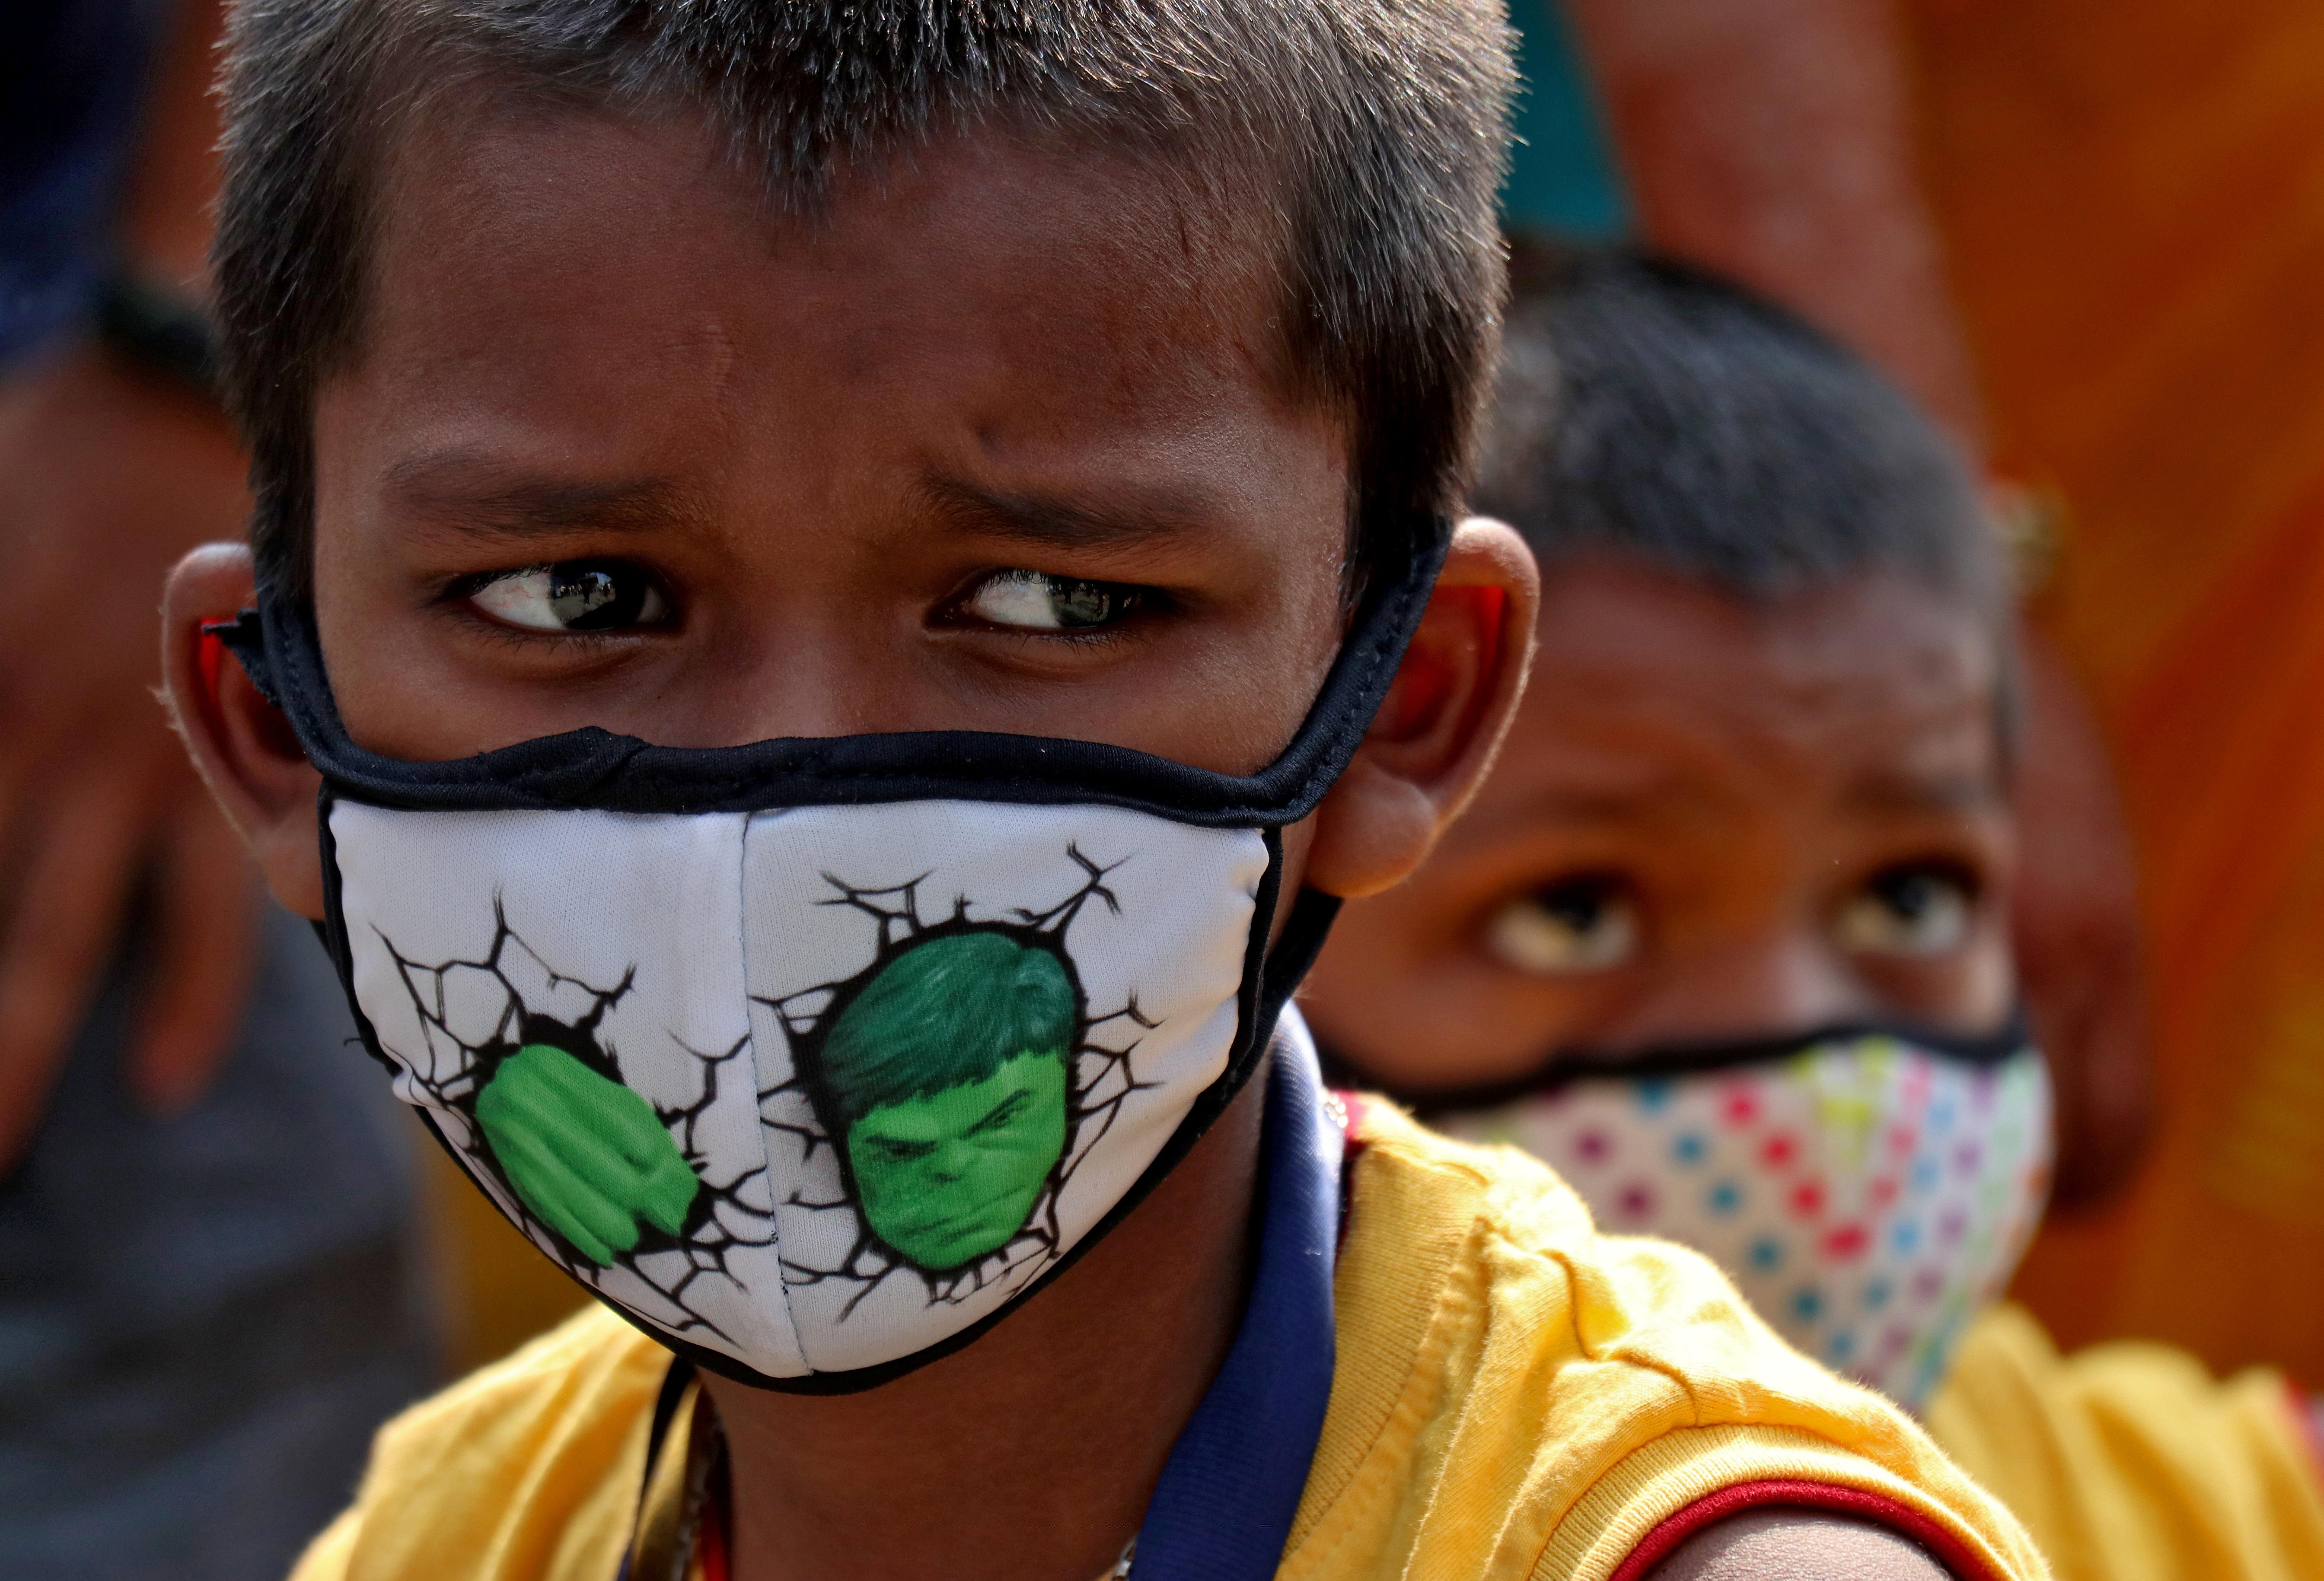 Children wearing protective masks wait to enter the Lokmanya Tilak Terminus railway station, amidst the spread of the coronavirus disease (COVID-19) in Mumbai, India, April 14, 2021. REUTERS/Niharika Kulkarni